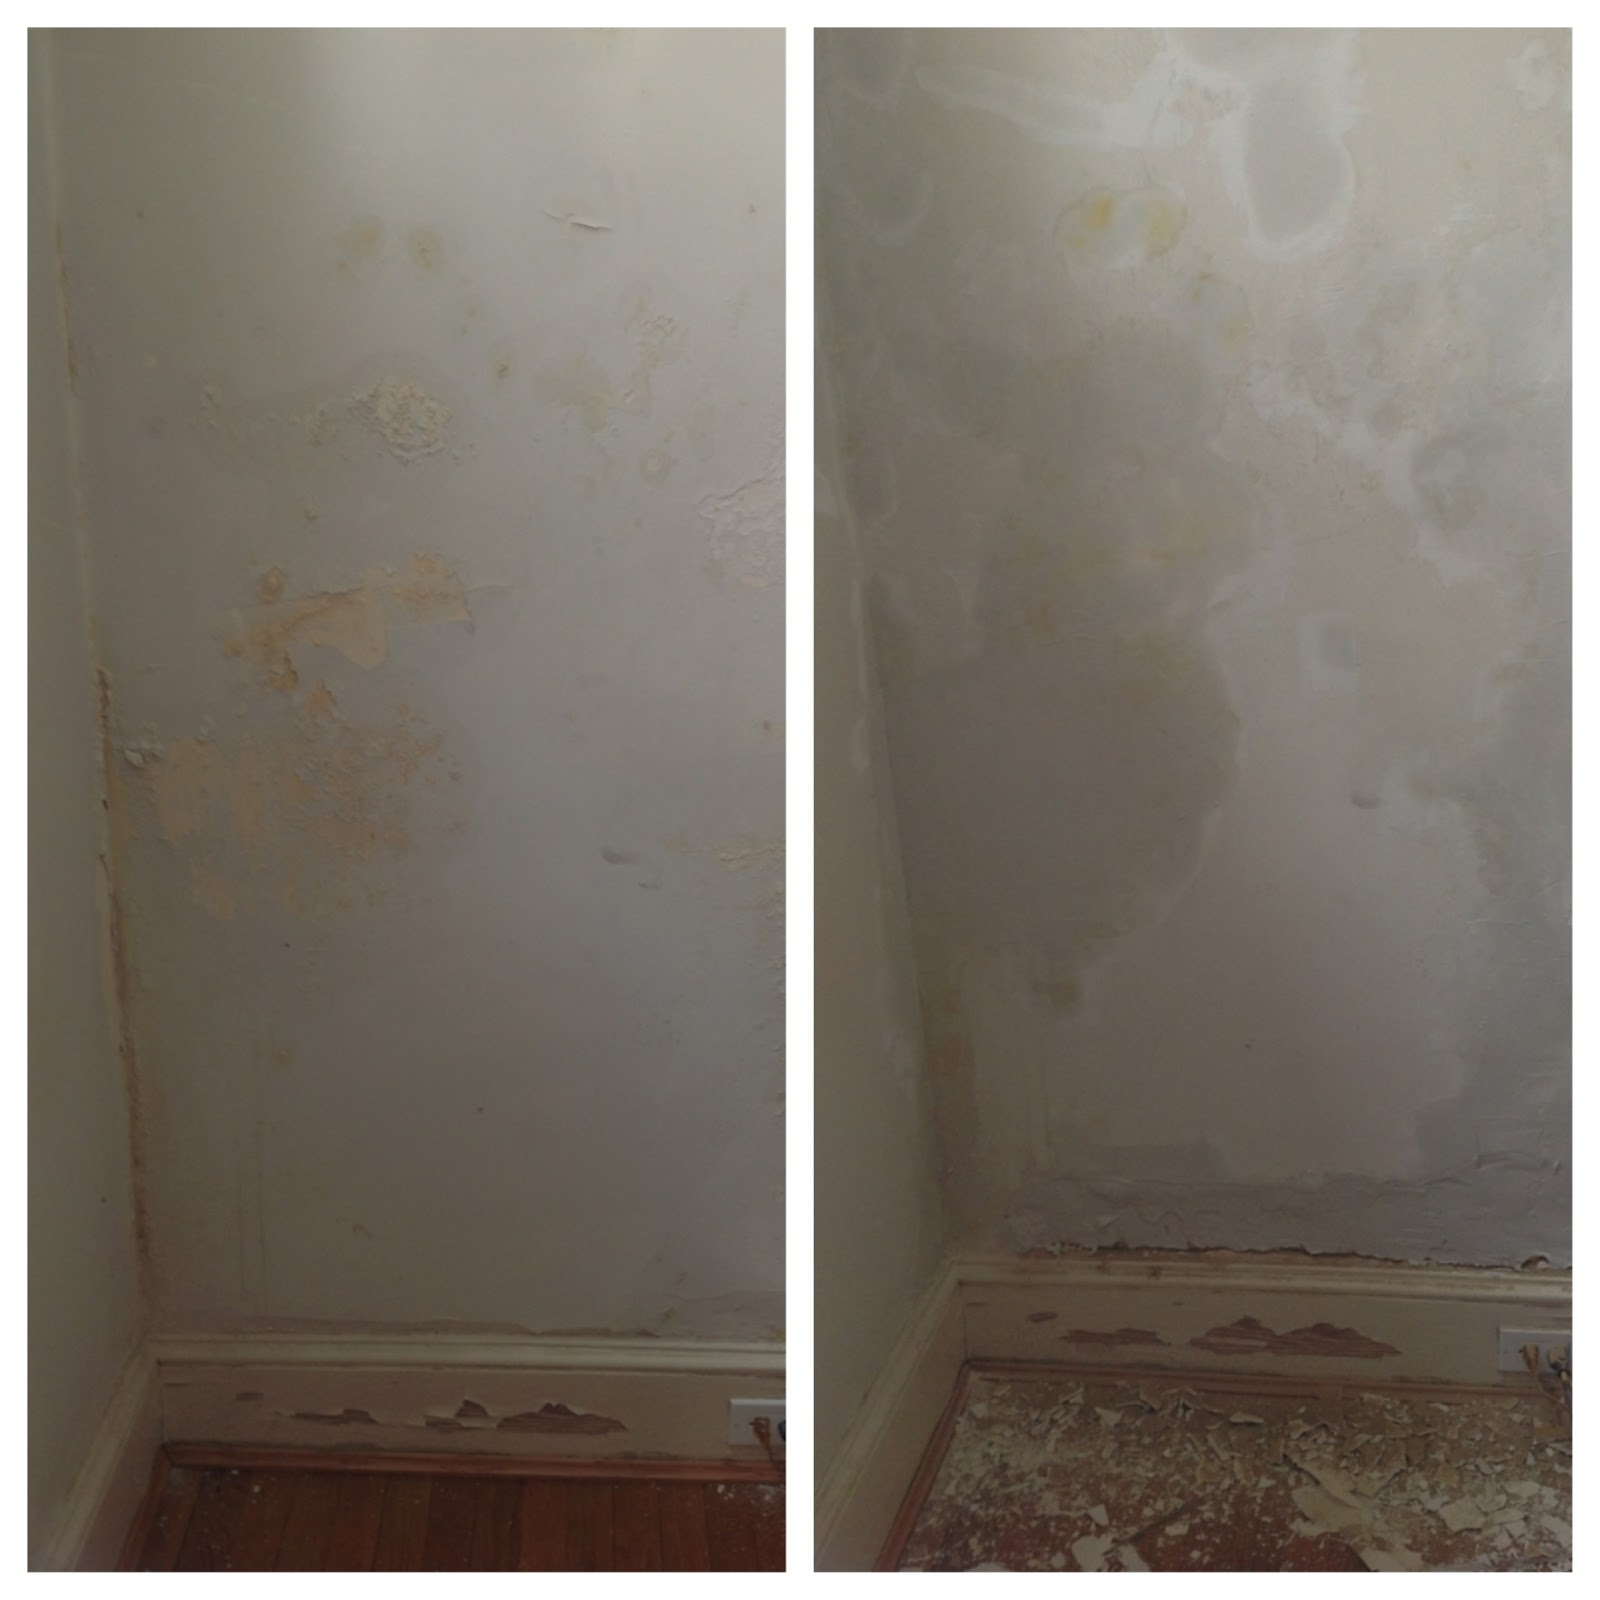 Repairing Cracks In Plaster Walls Before Painting Anilc